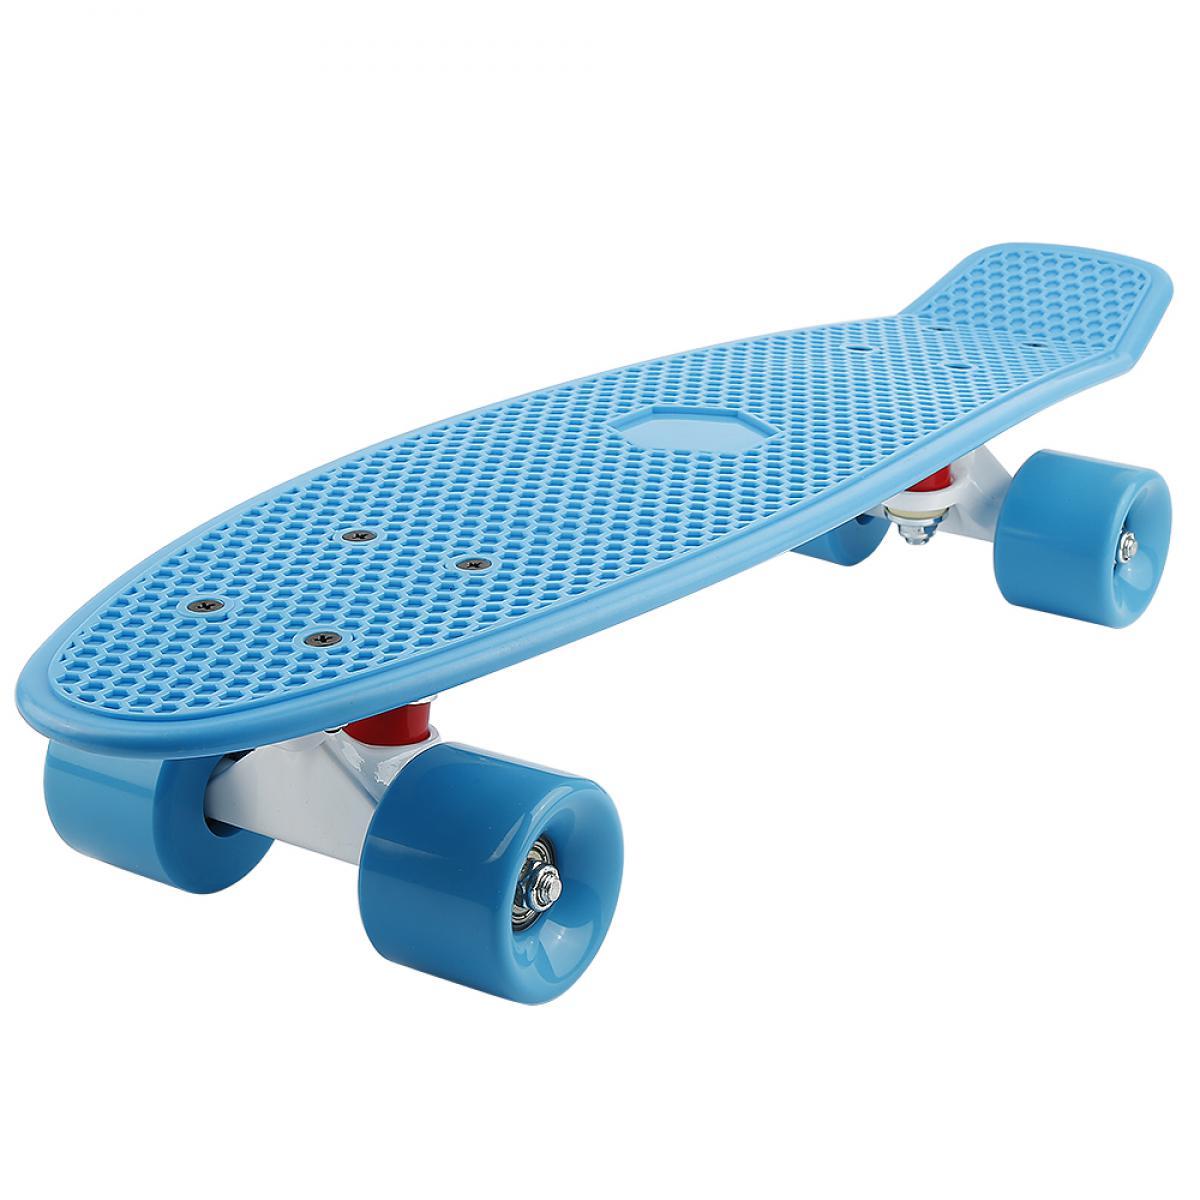 Ltppstore Skateboard Enfant, Skateboard Plastique, Skateboard Retro, Panneau PP + Support en Alliage d'aluminium + Roues PU, 57 *